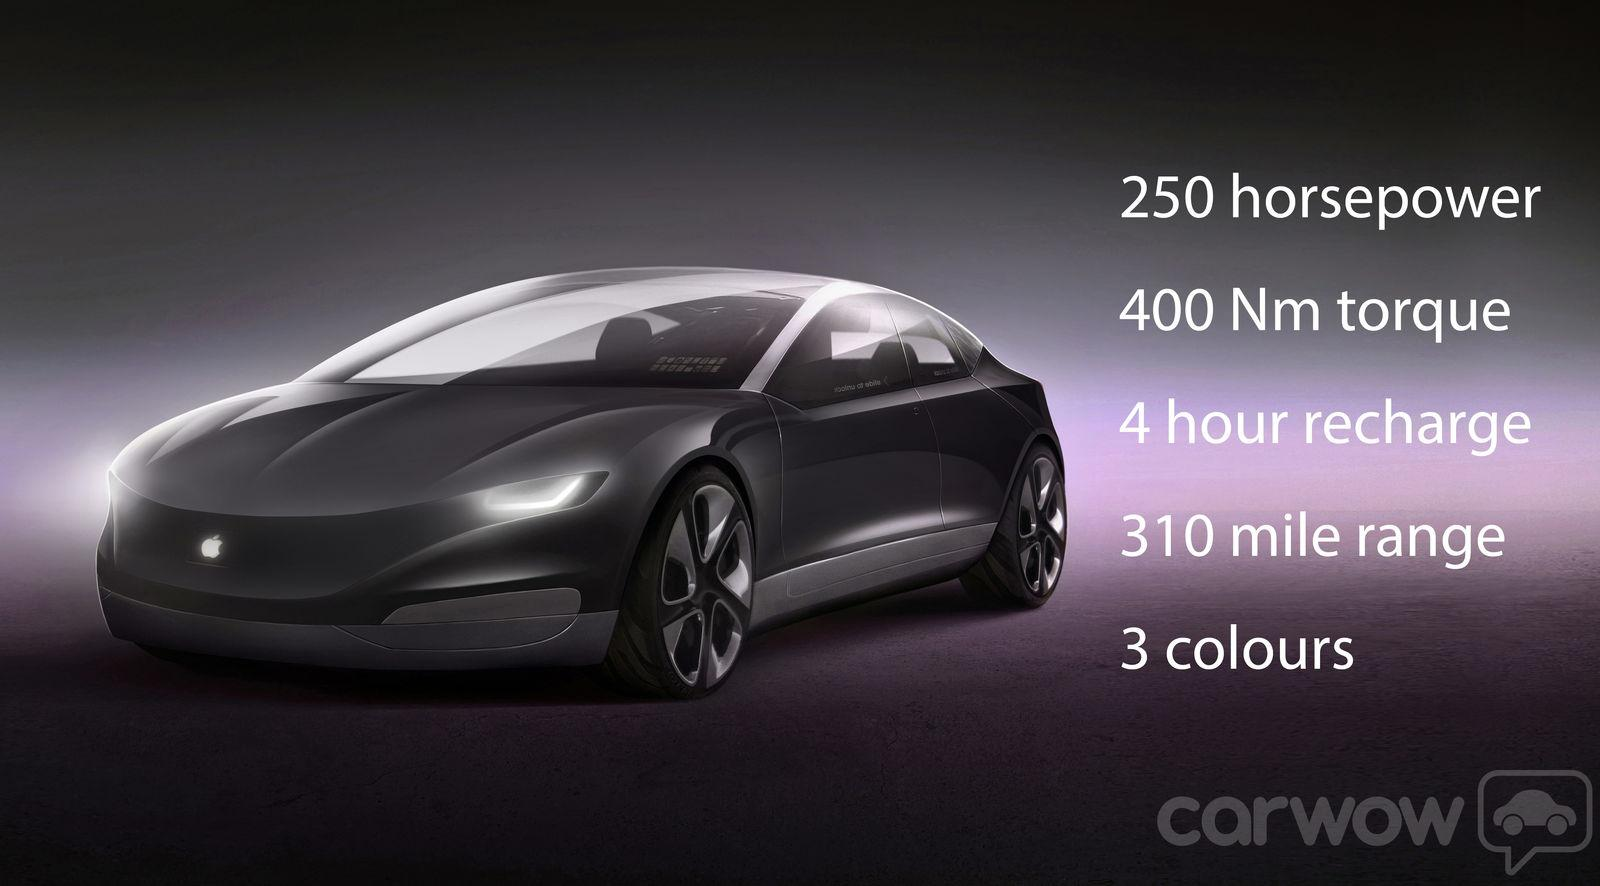 Minivan For Sale >> Apple iCar Digitally Imagined EV Makes a Compelling Case ...